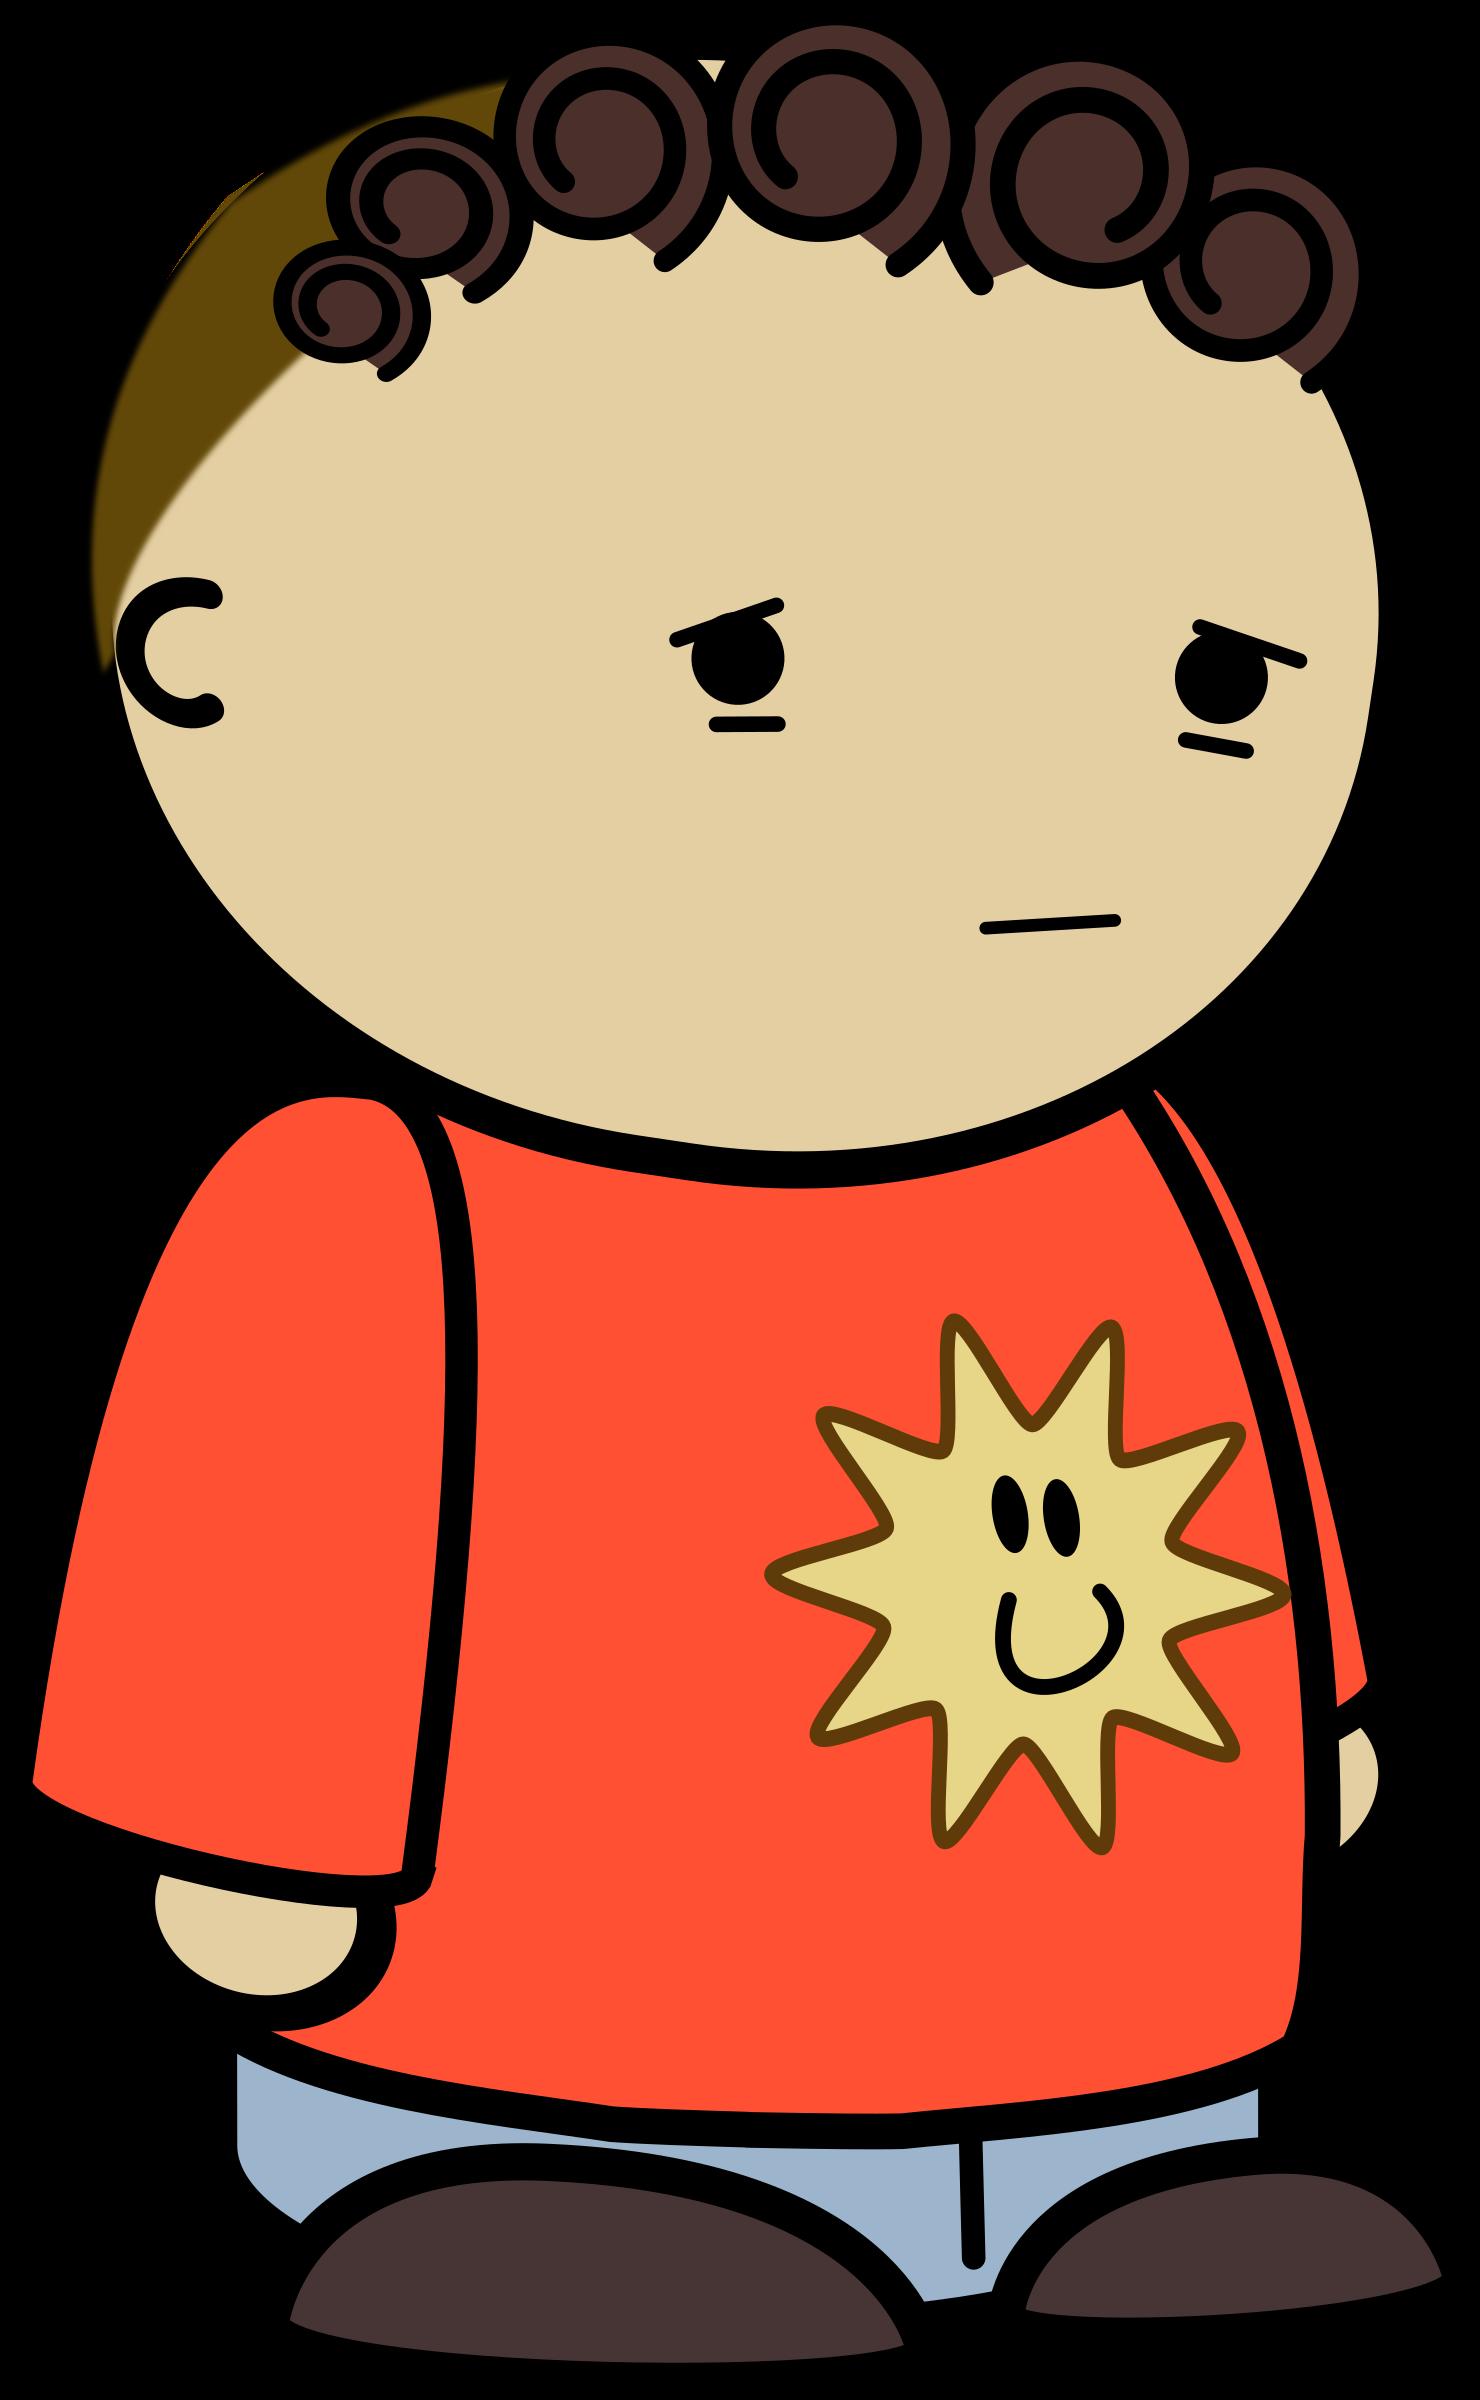 Match clipart illustration. Mix and character jordan